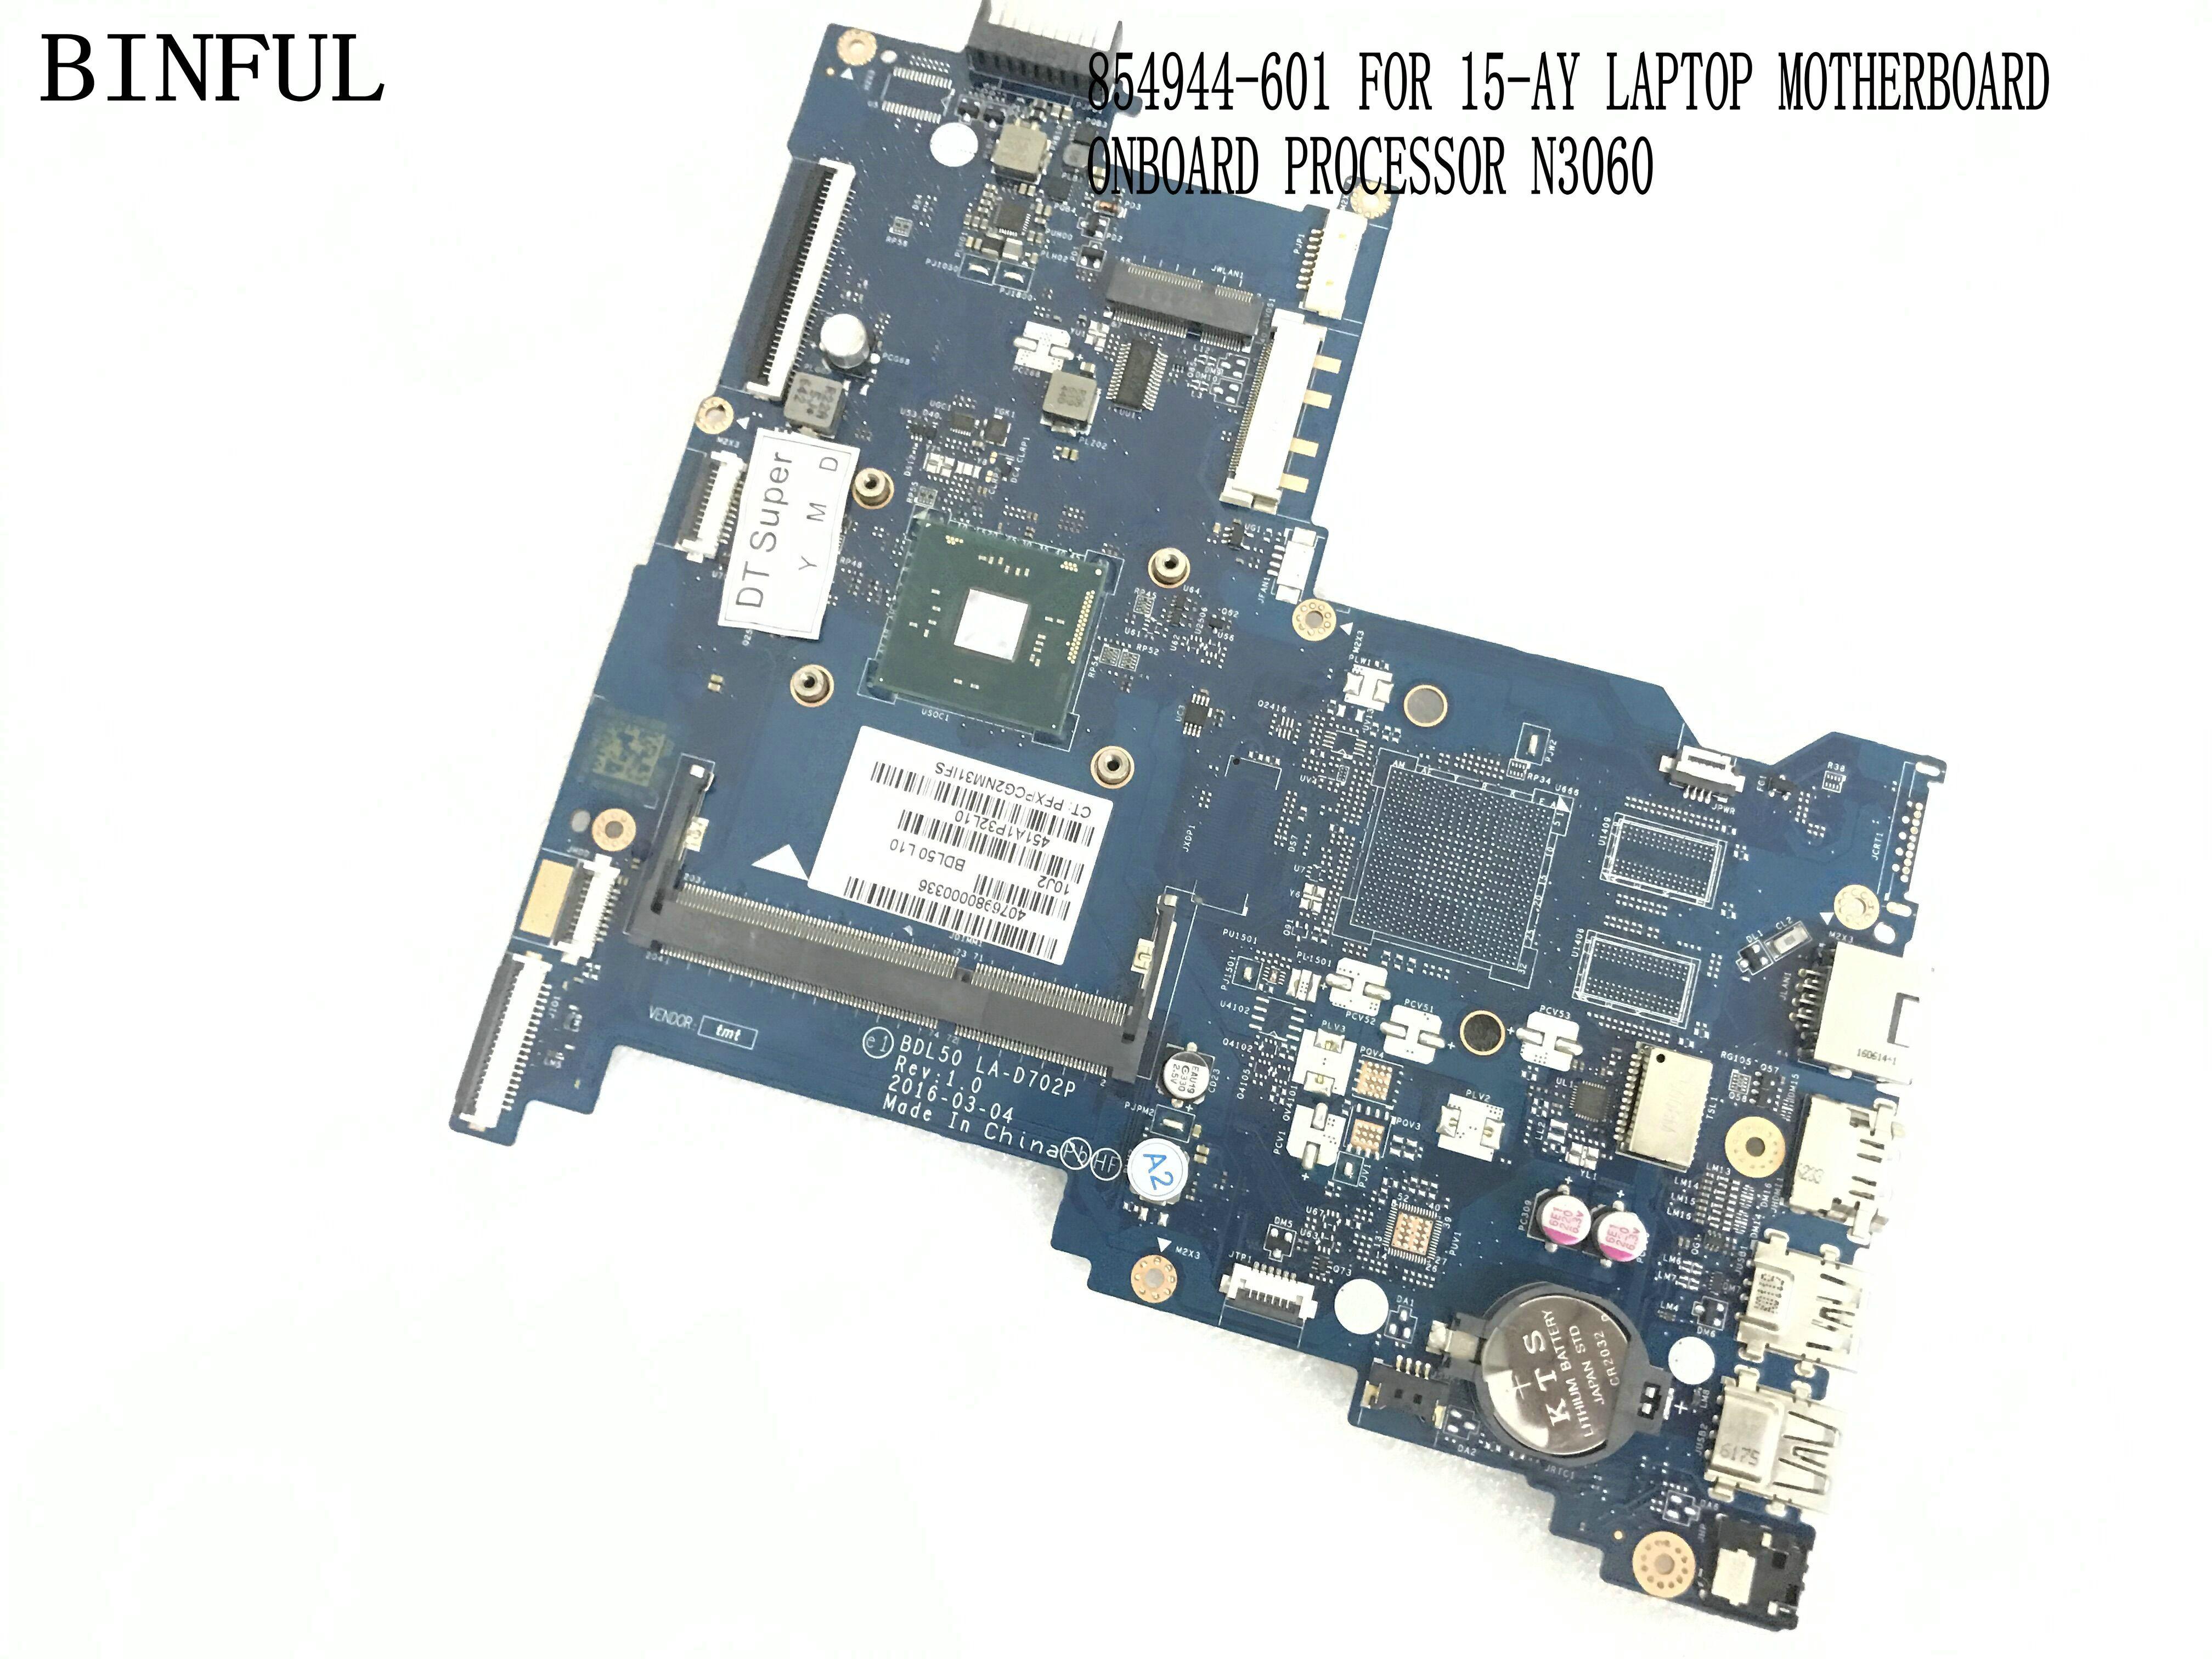 BiNFUL STOCK NEW 854944-601 BLD50 LA-D702P LAPTOP MOTHERBOARD FOR HP 15-AY / 15-AU NOTEBOOK MAINBOARD ONBOARD N3060 PROCESSOR